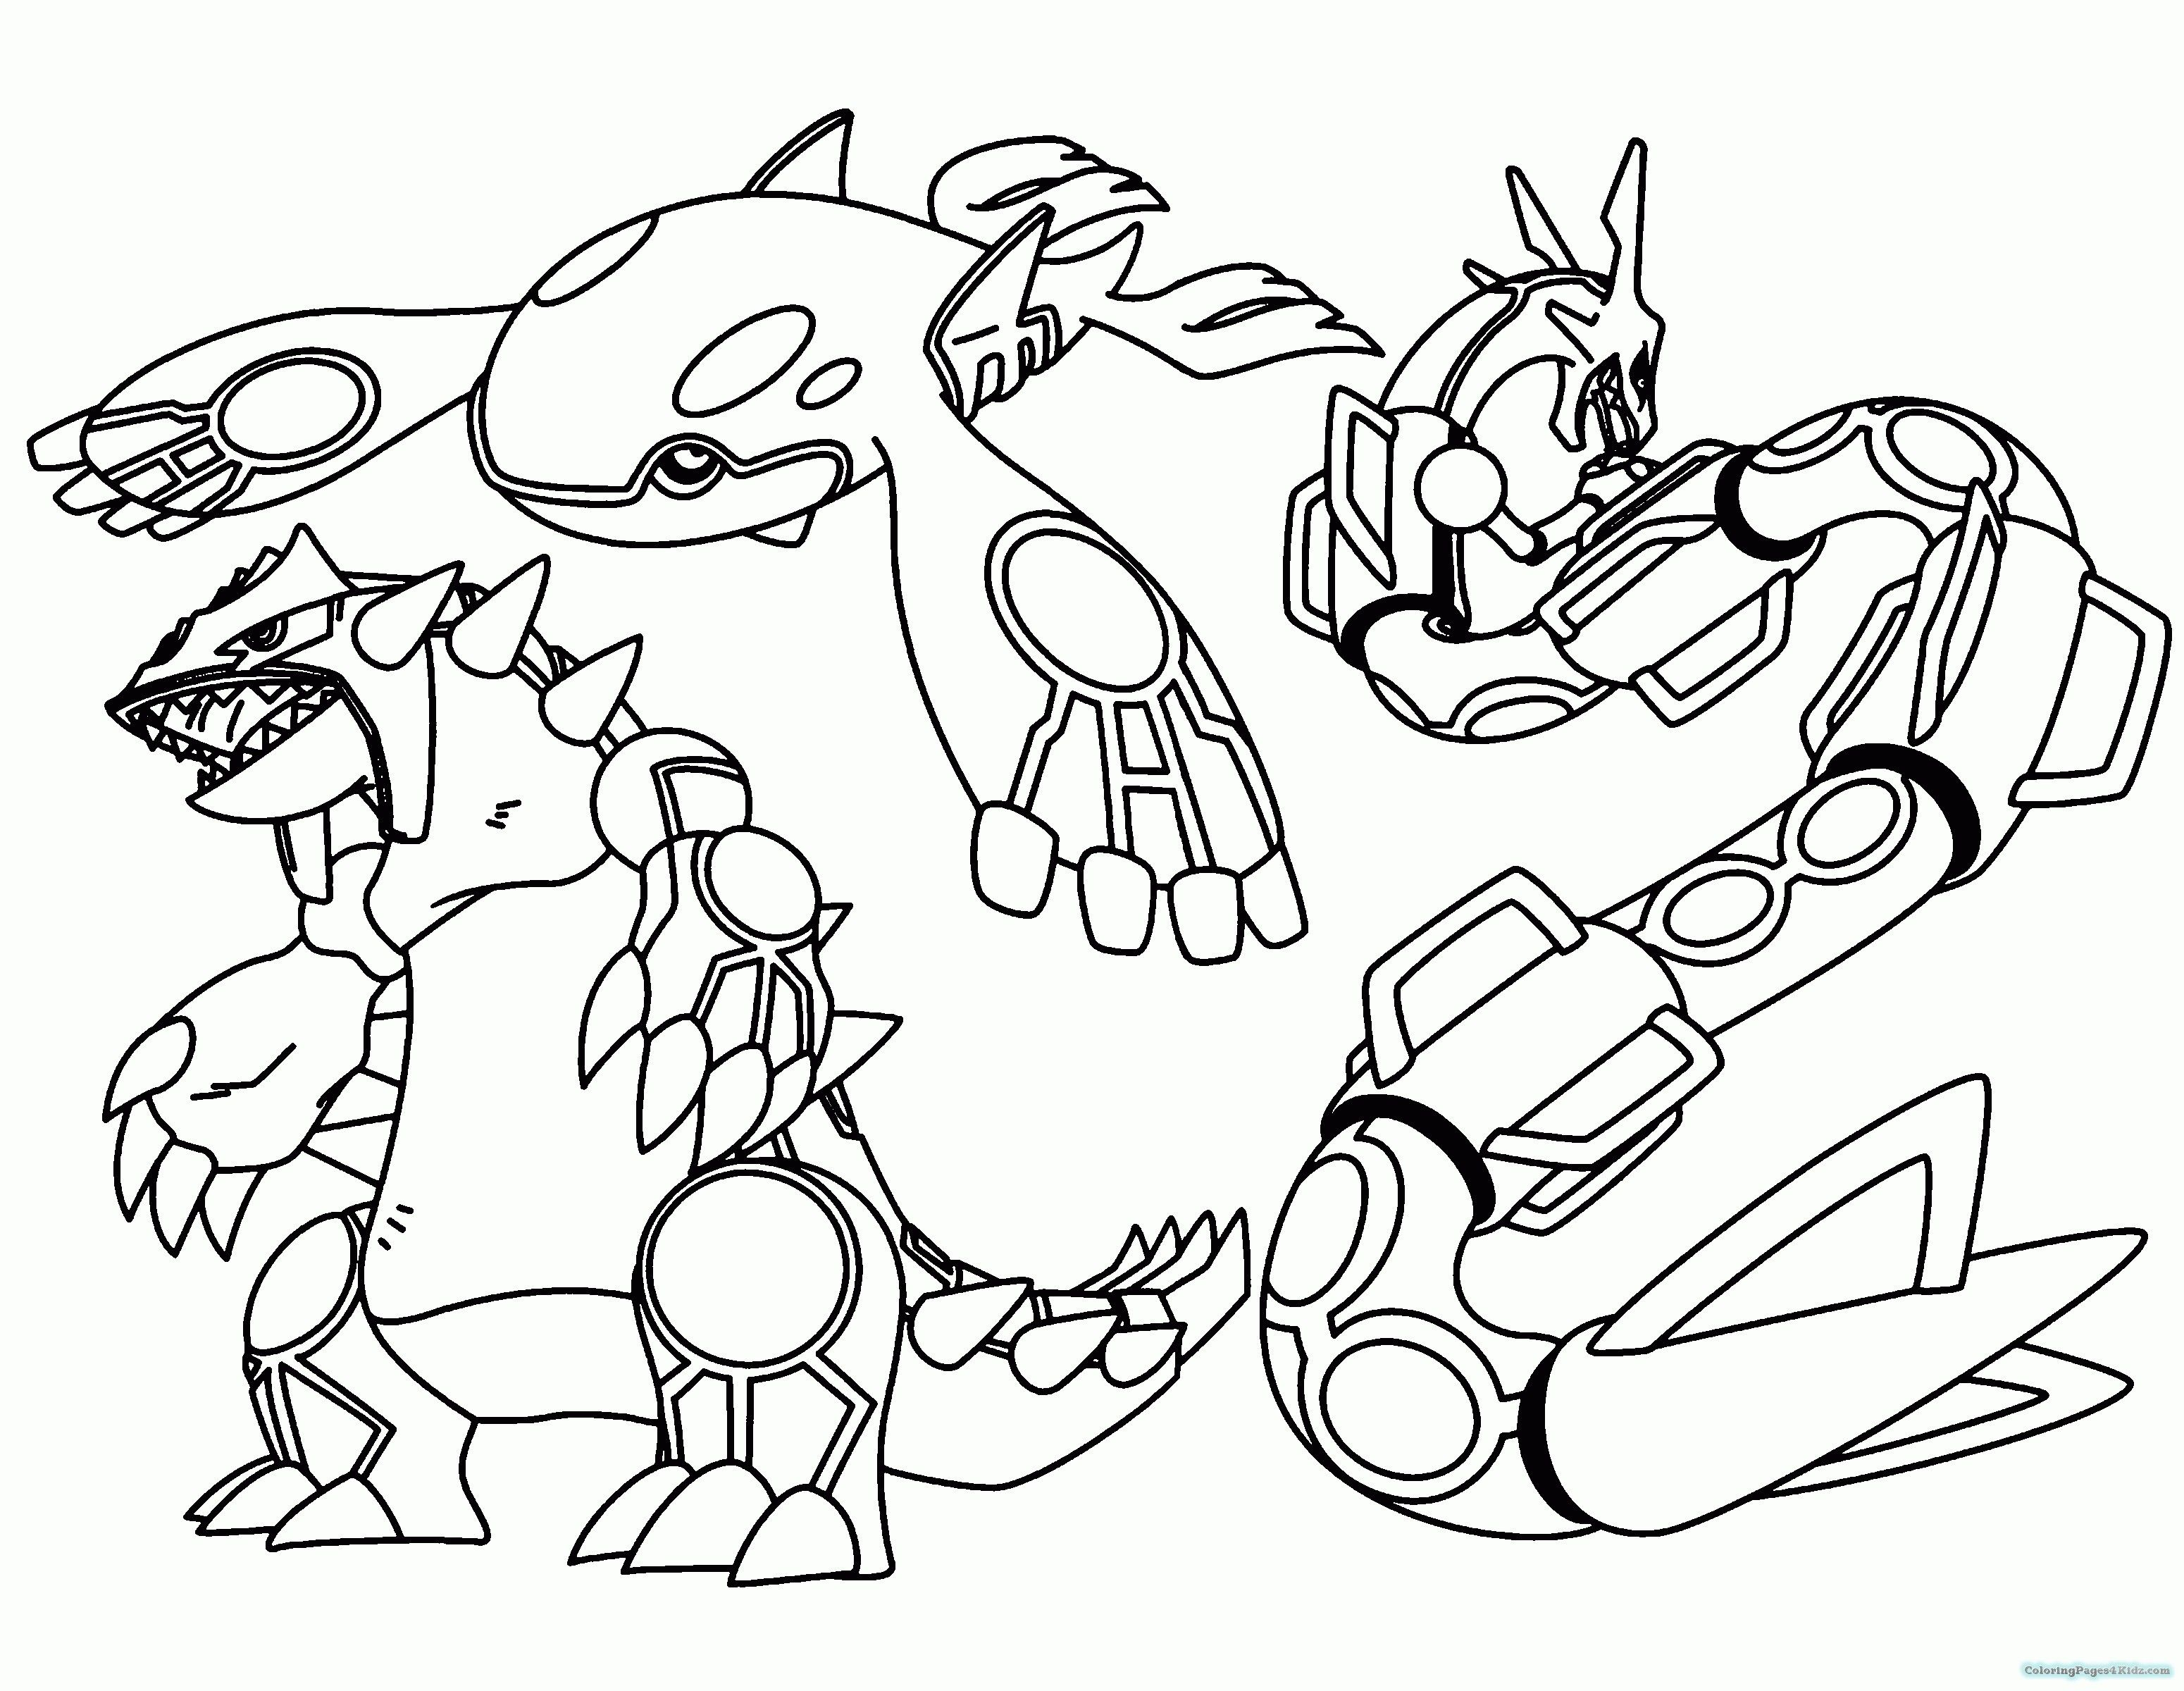 27 Inspiration Image Of Free Printable Pokemon Coloring Pages Entitlementtrap Com Pokemon Coloring Pages Mandala Coloring Pages Cartoon Coloring Pages